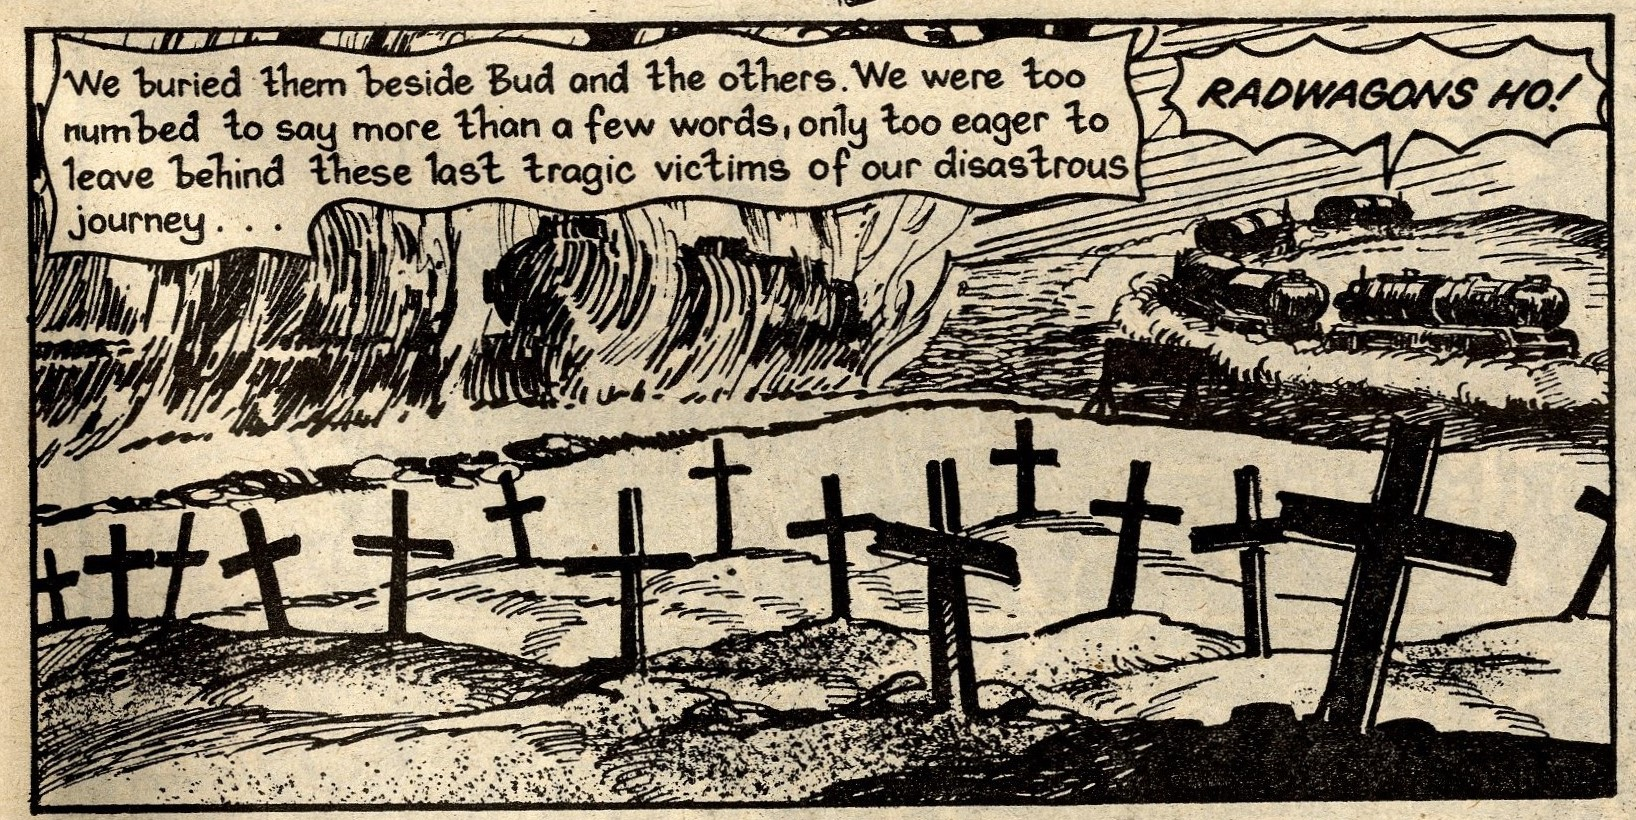 Hell-trekkers: John Wagner and Alan Grant (writers), Horacio Lalia (artist)